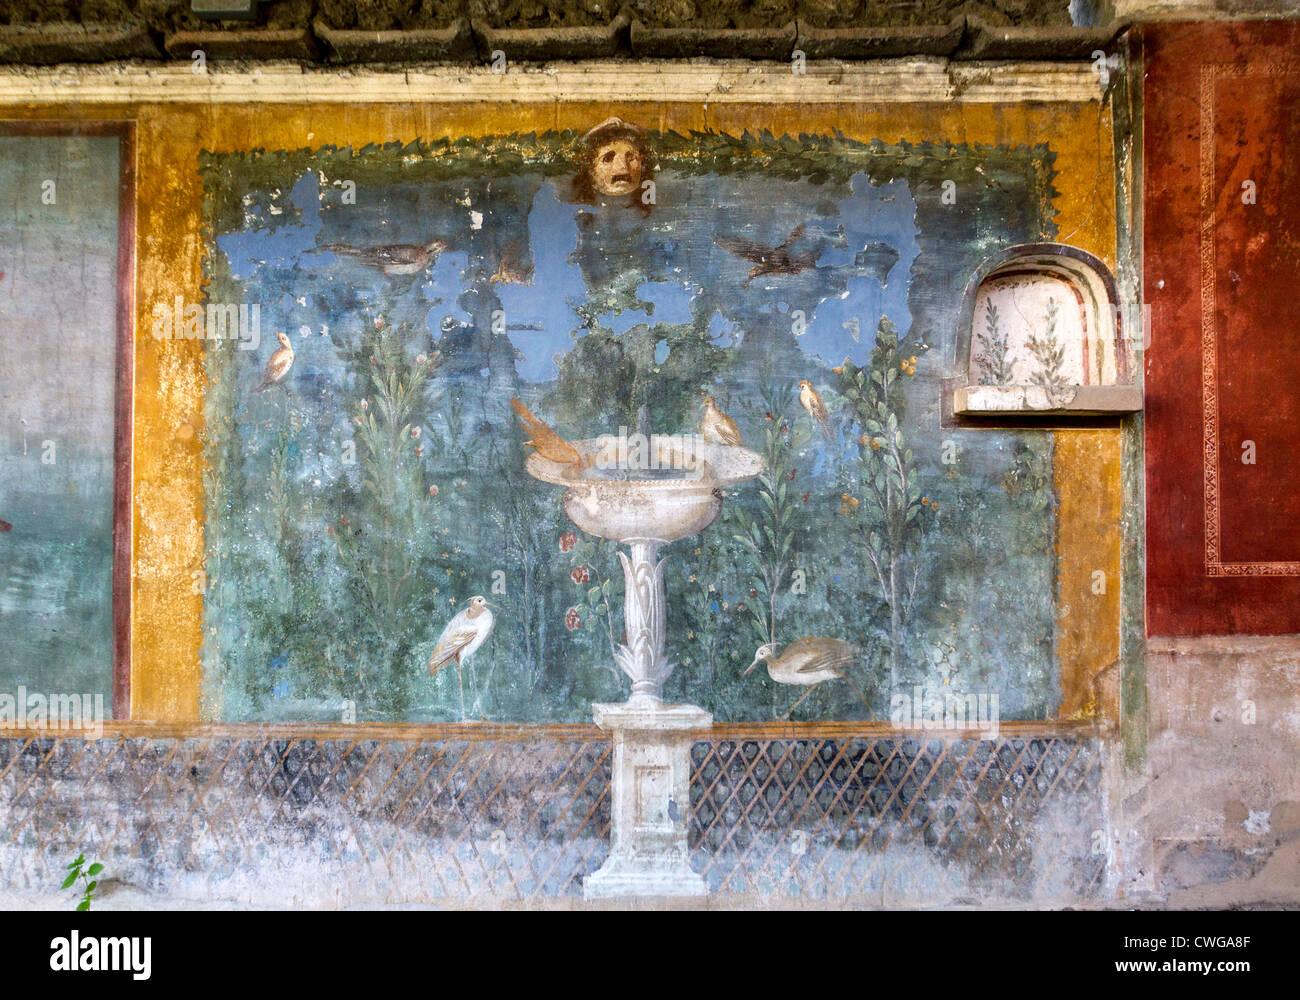 Roman Wall Painting Of Garden